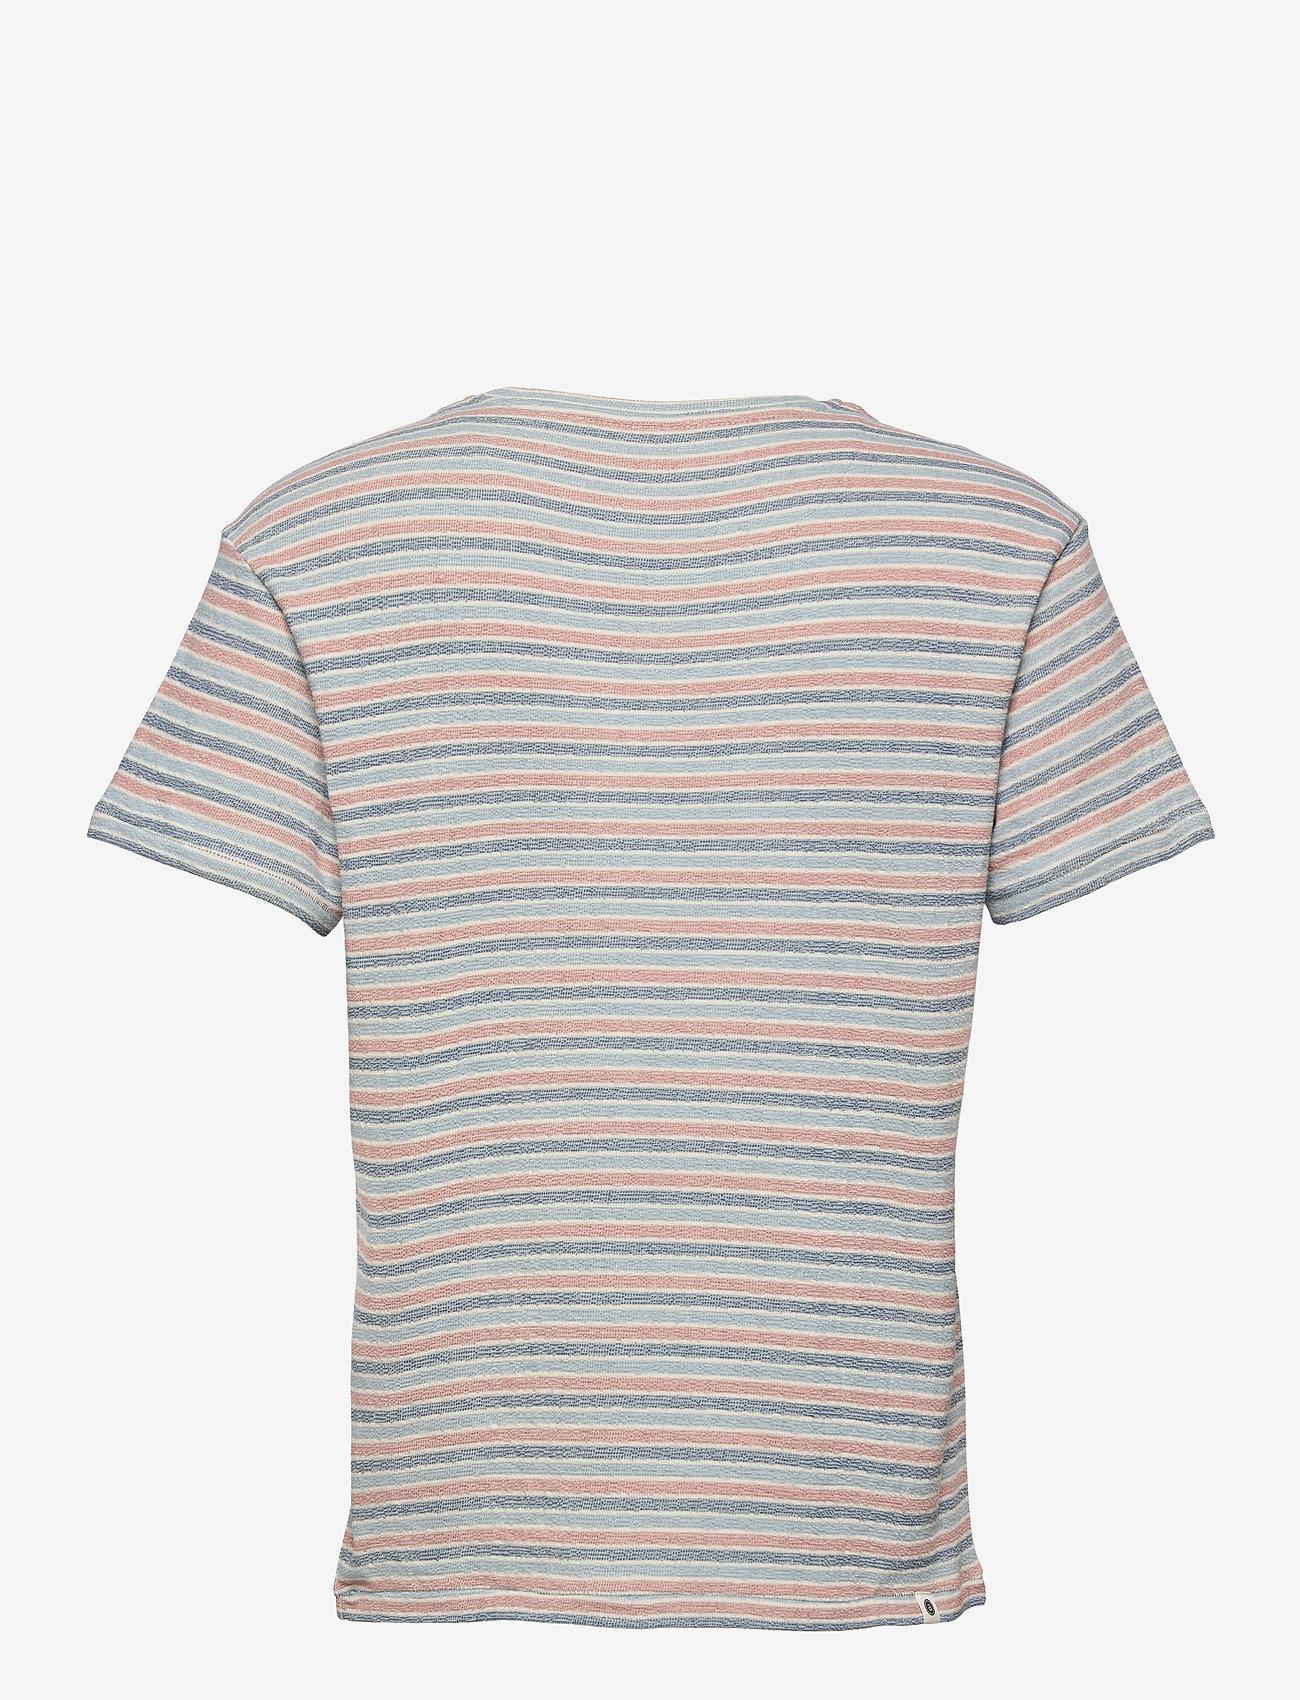 Anerkjendt - AKKIKKI STRIPE - t-shirts à manches courtes - tofu - 1